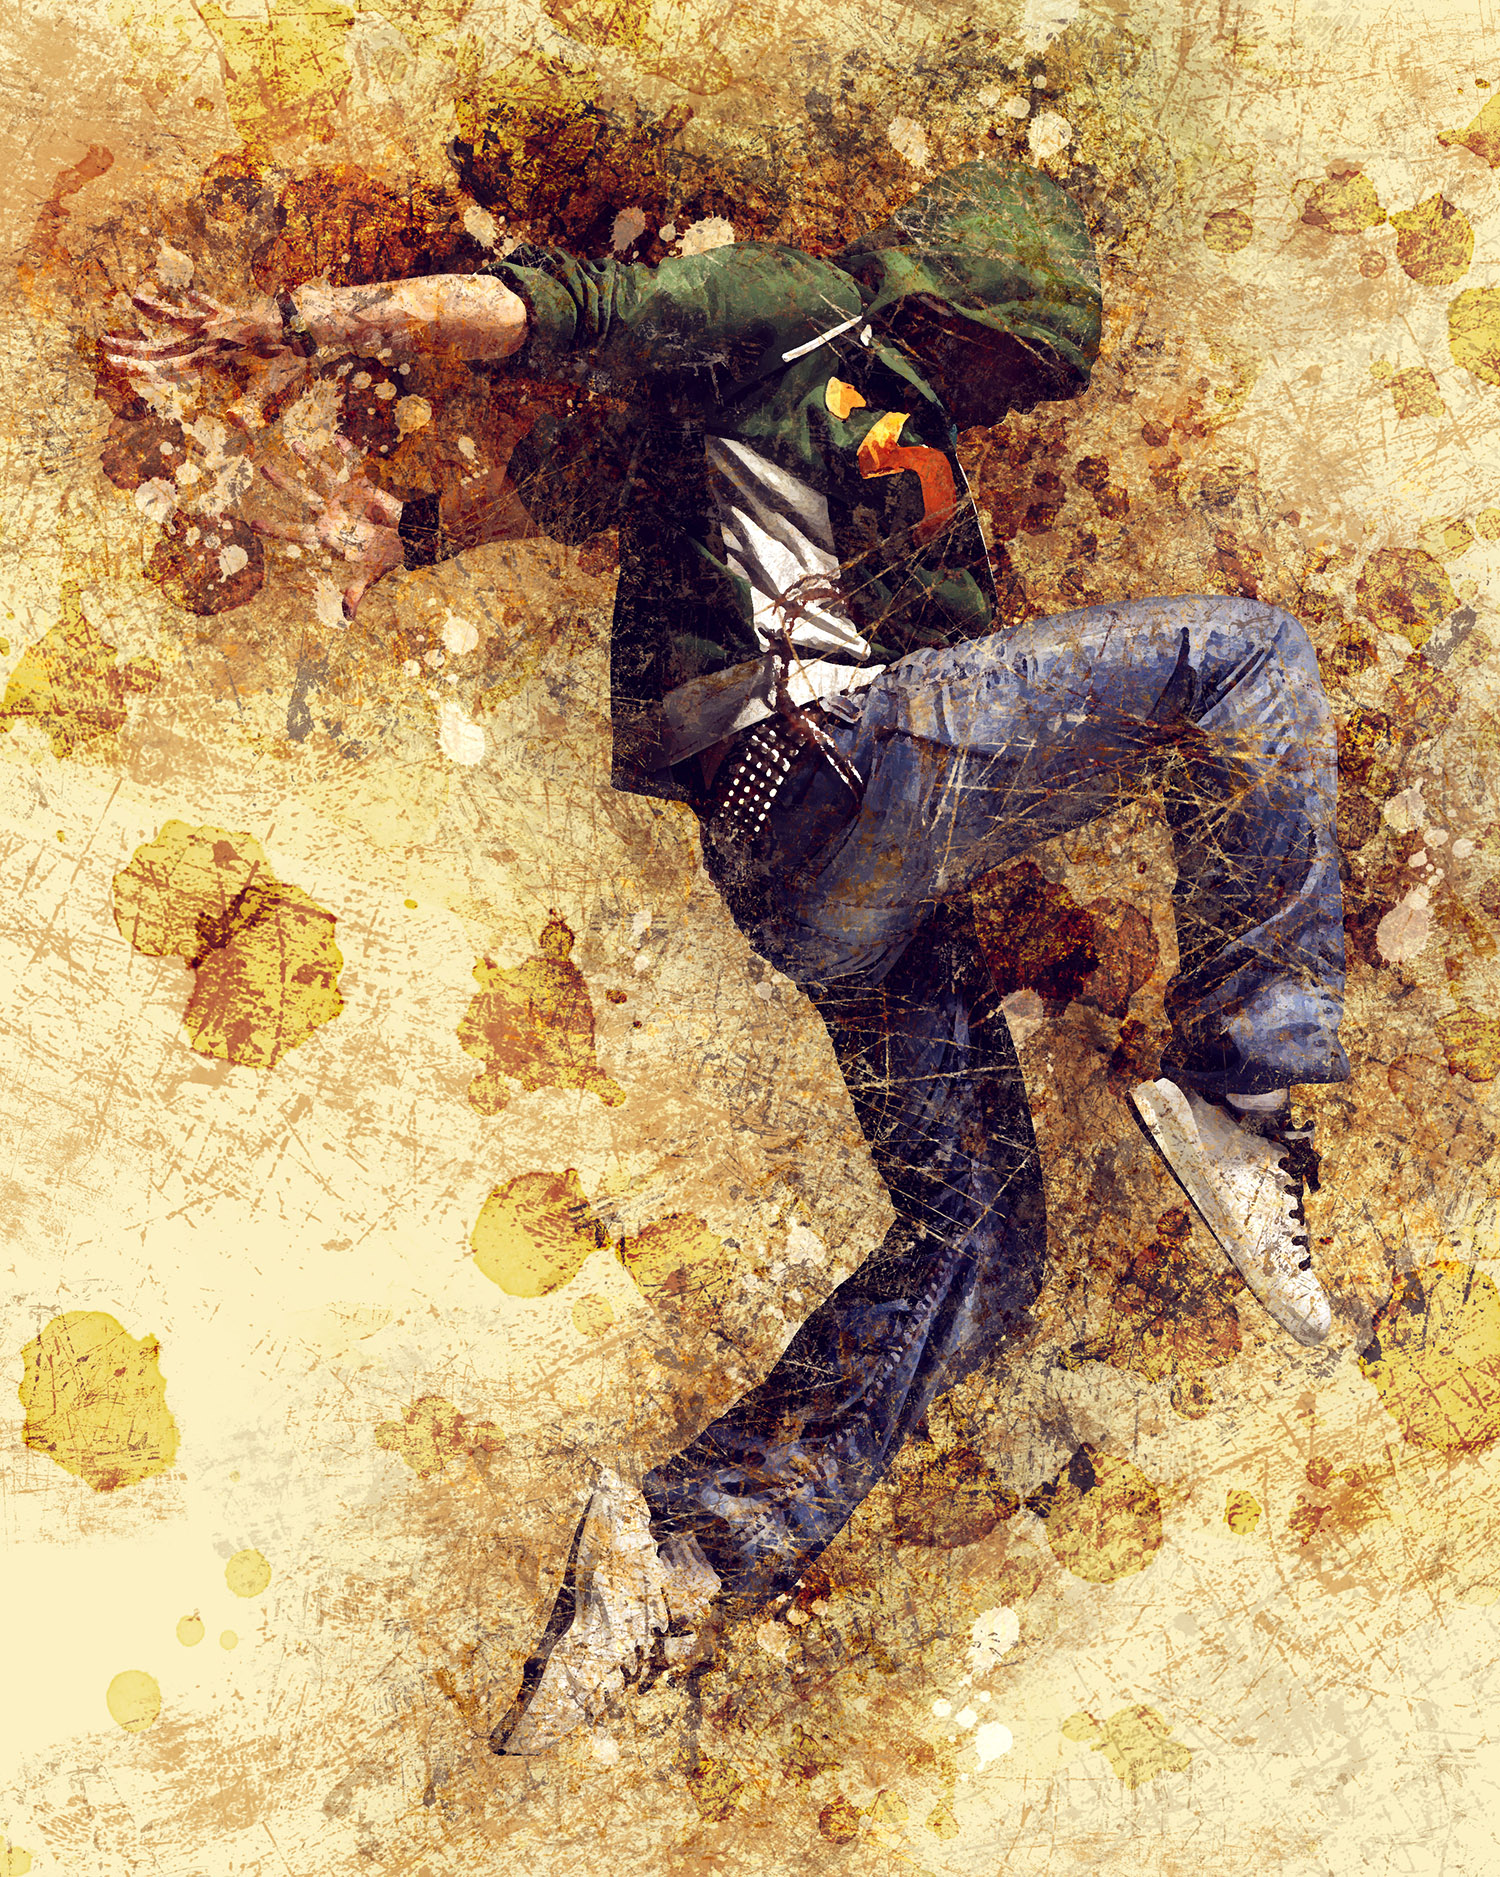 HQ Grunge Art Wallpapers | File 1451.14Kb